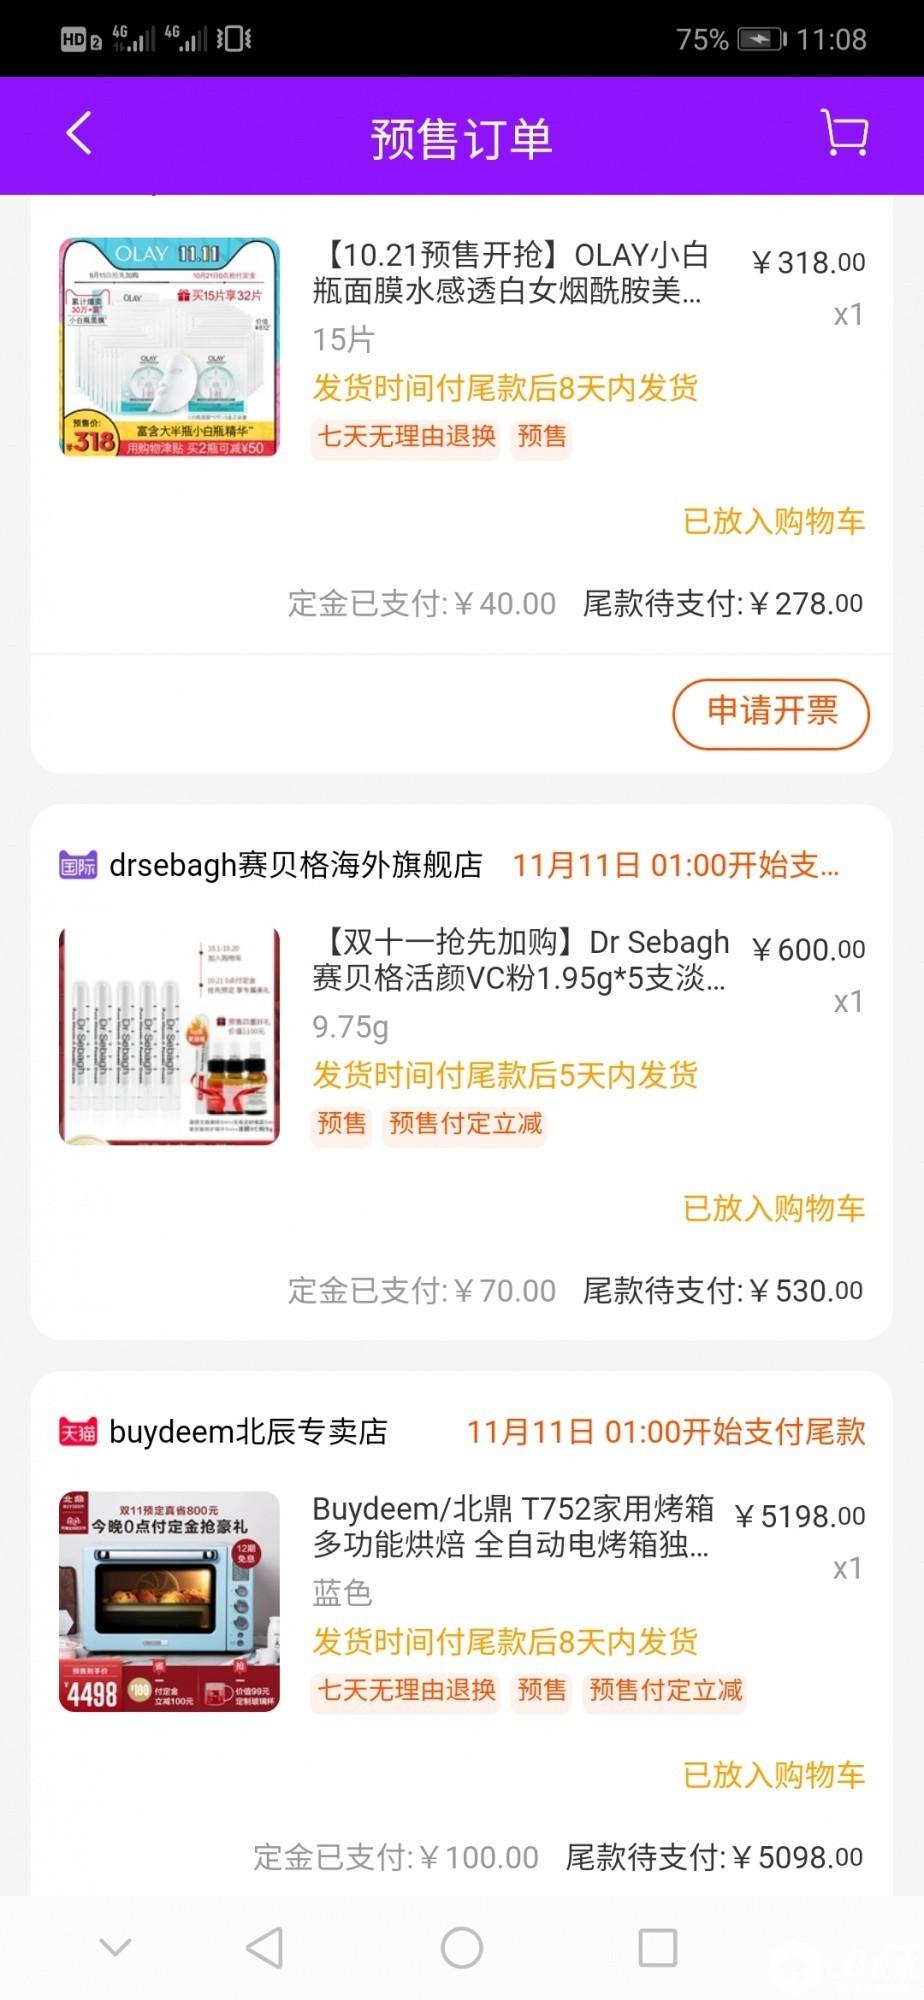 Screenshot_20191031_230824_com.taobao.taobao.jpg